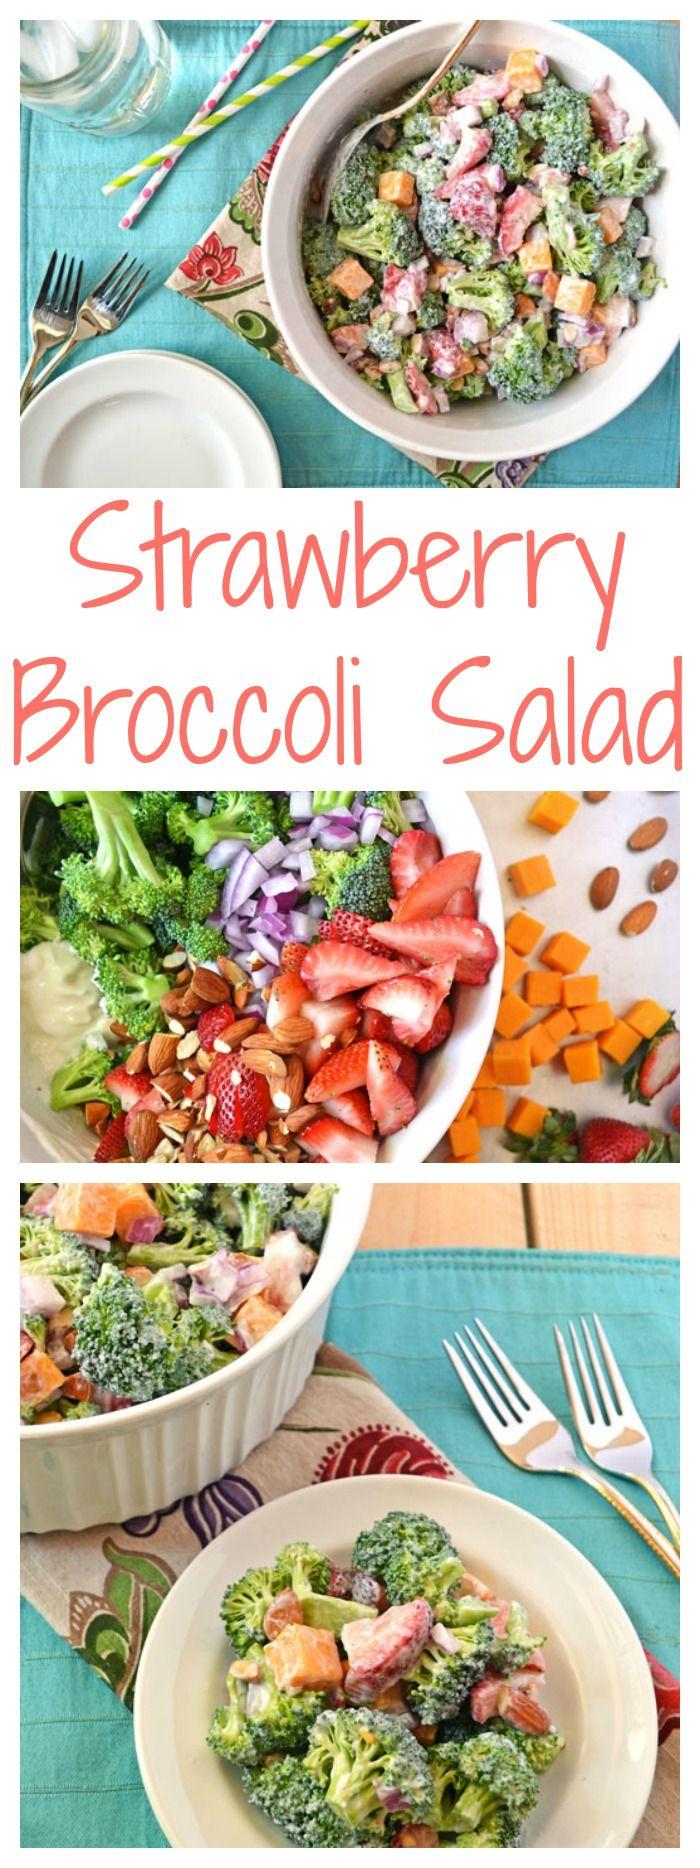 Strawberry Broccoli Salad // Awesome salad recipe!